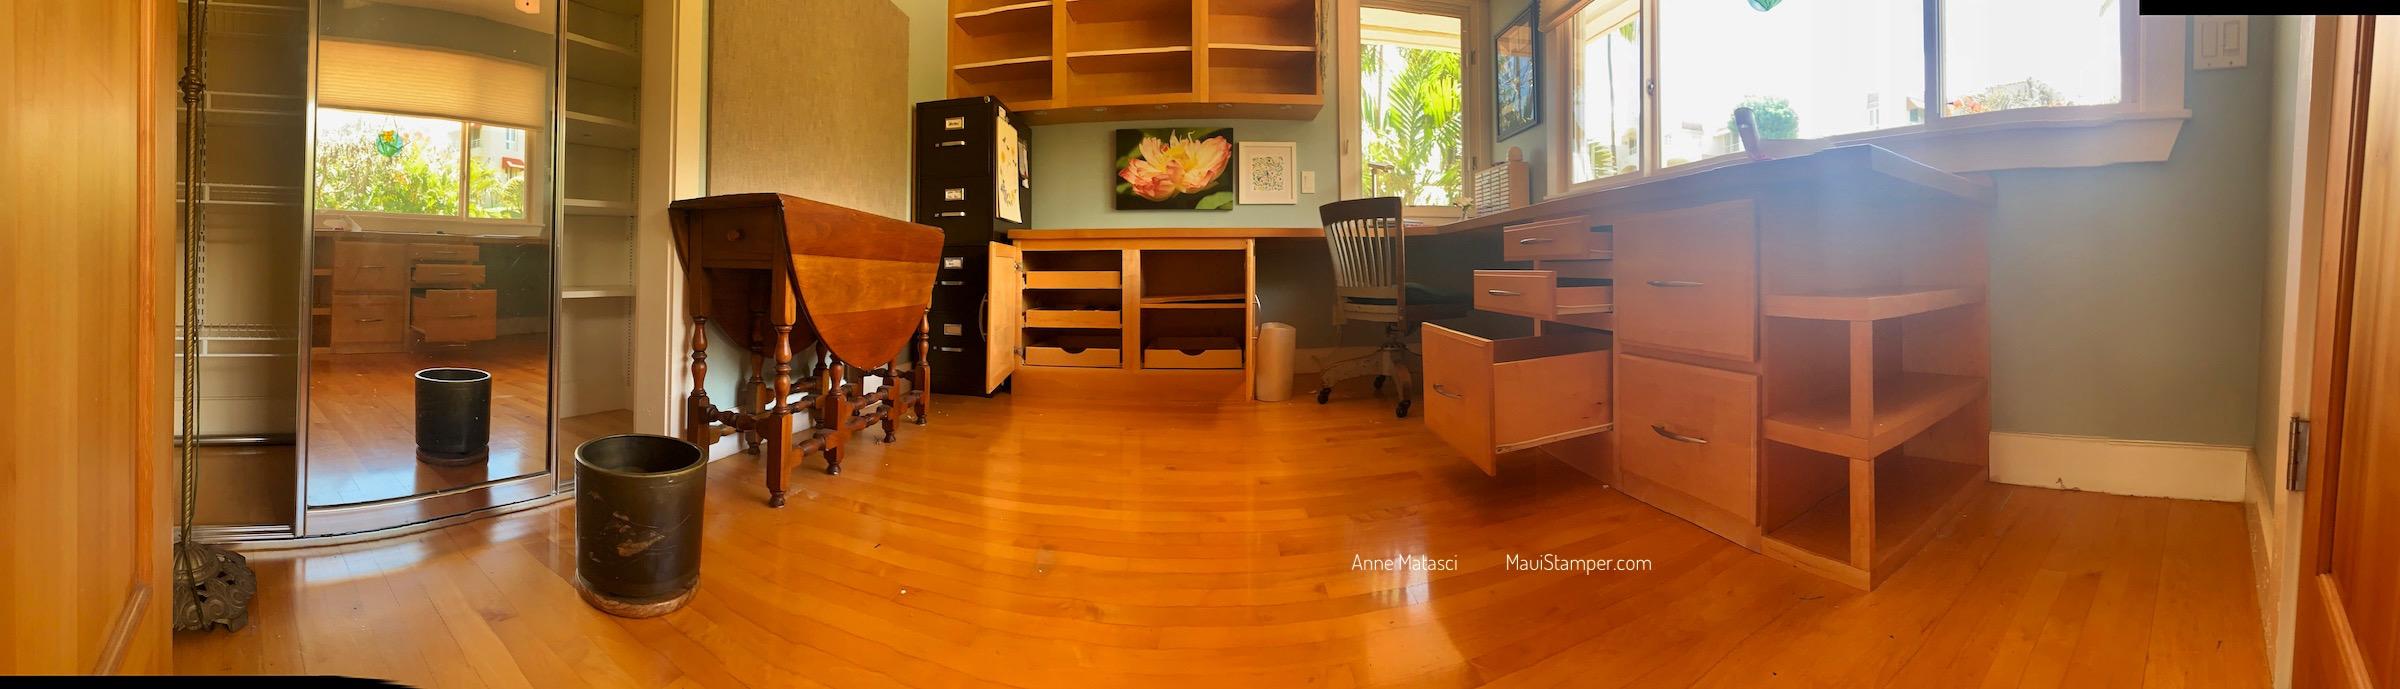 Maui Stamper Stampin Up Empty Craft Room